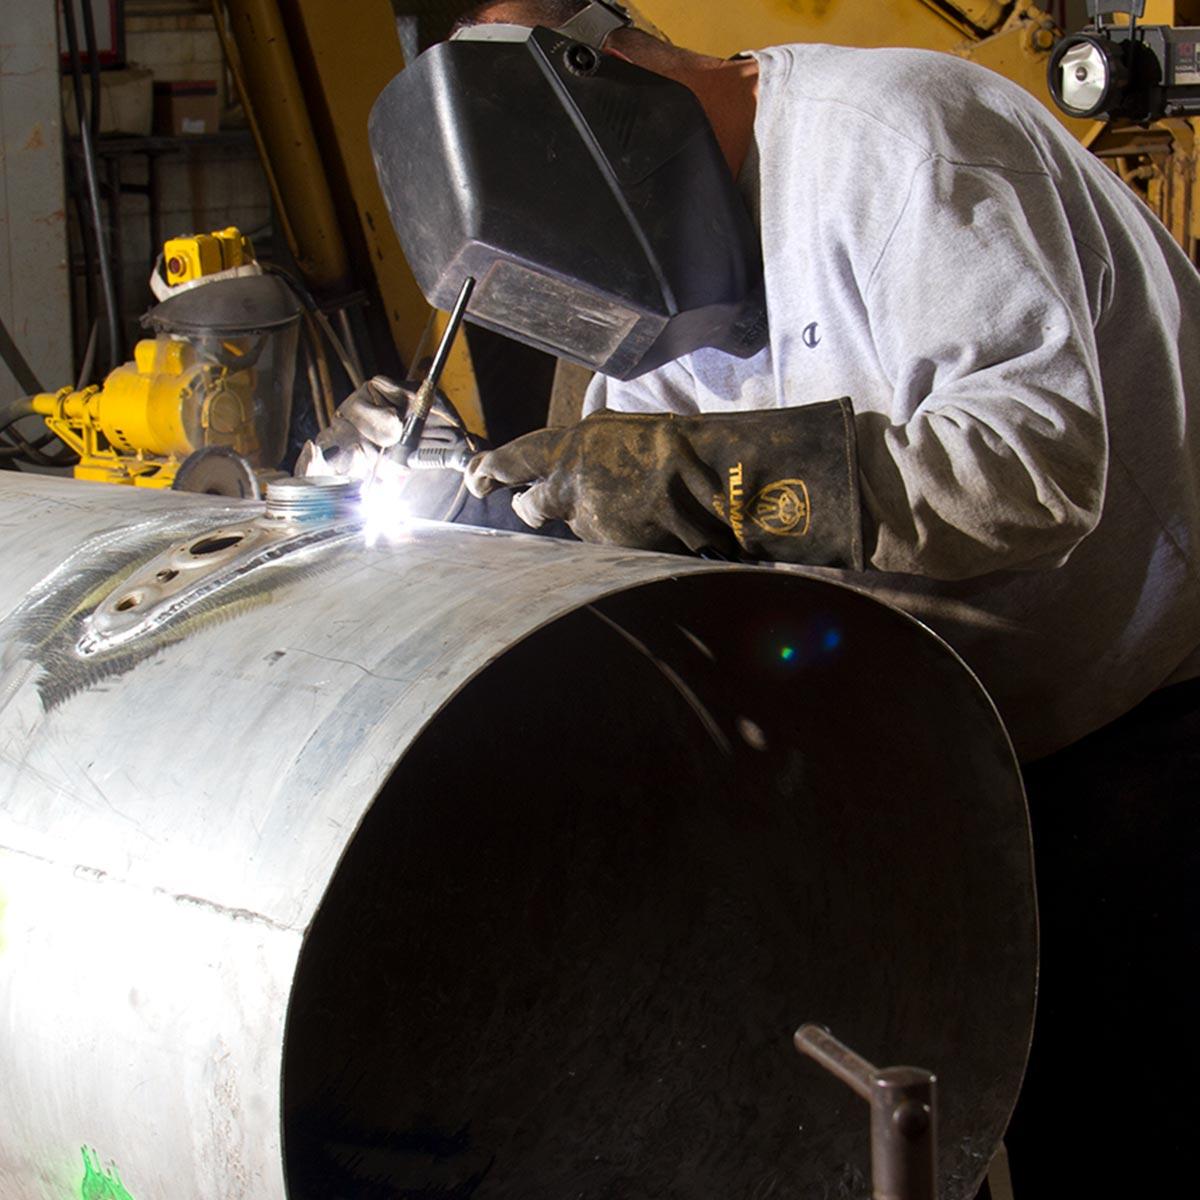 Welding for tank repair at Cicioni.